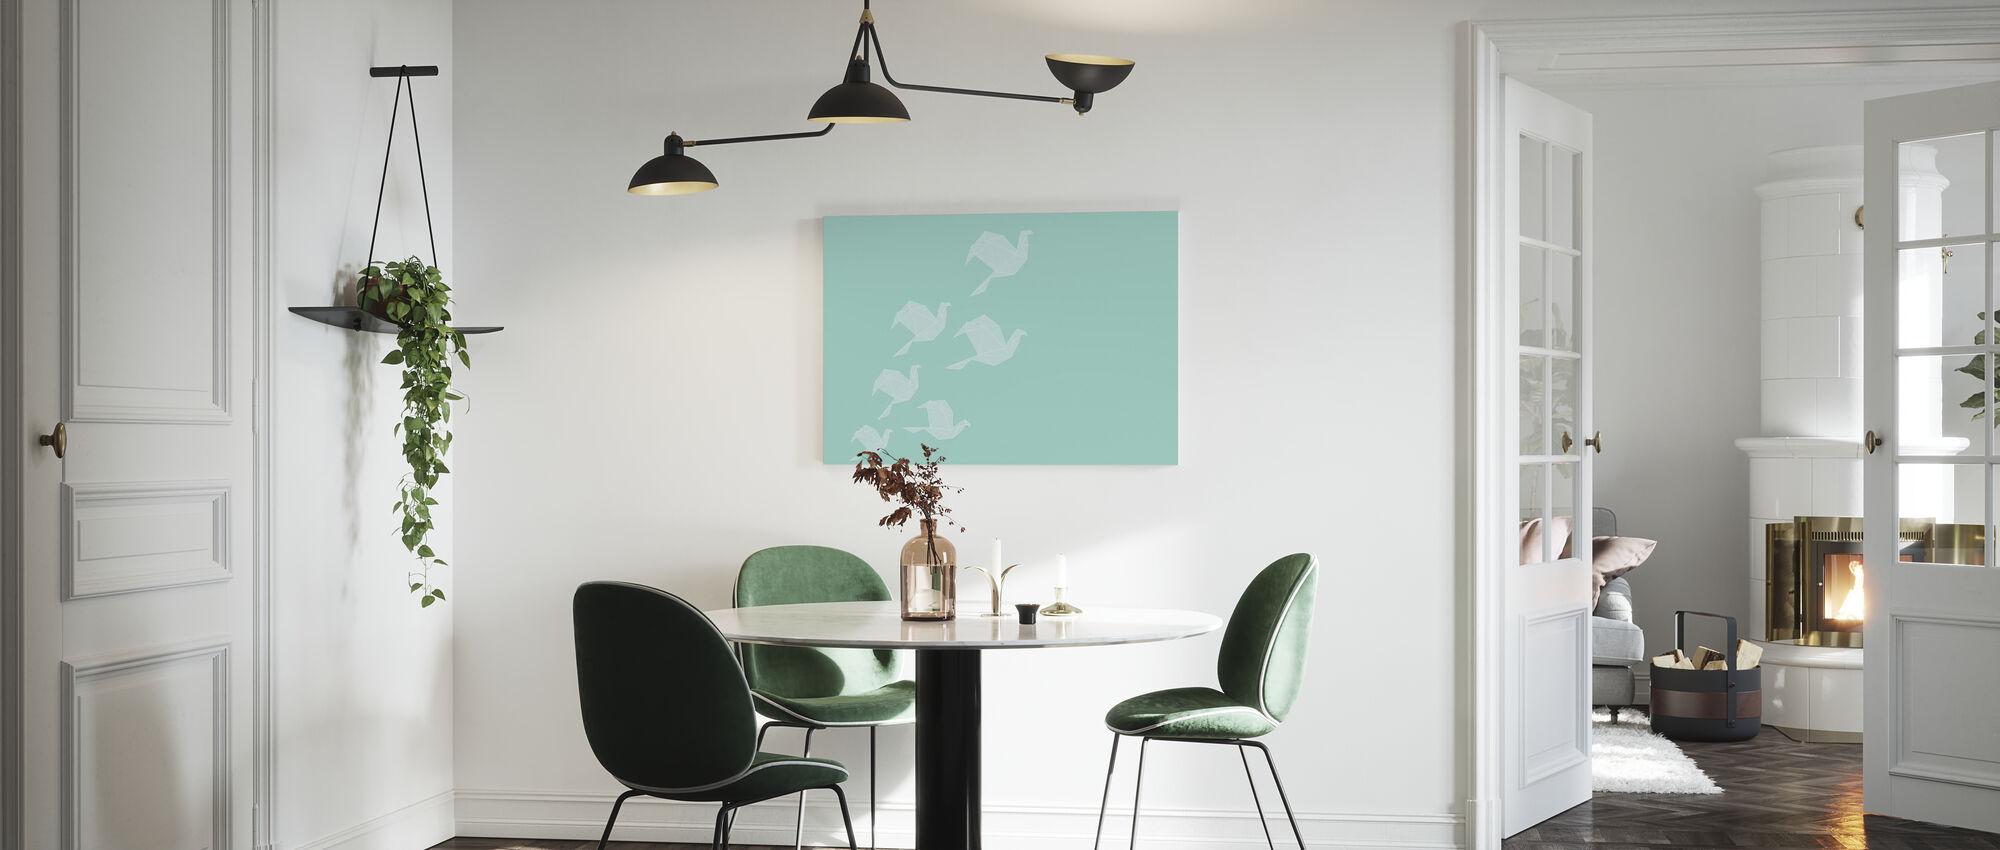 Origami Turquoise - Canvas print - Kitchen